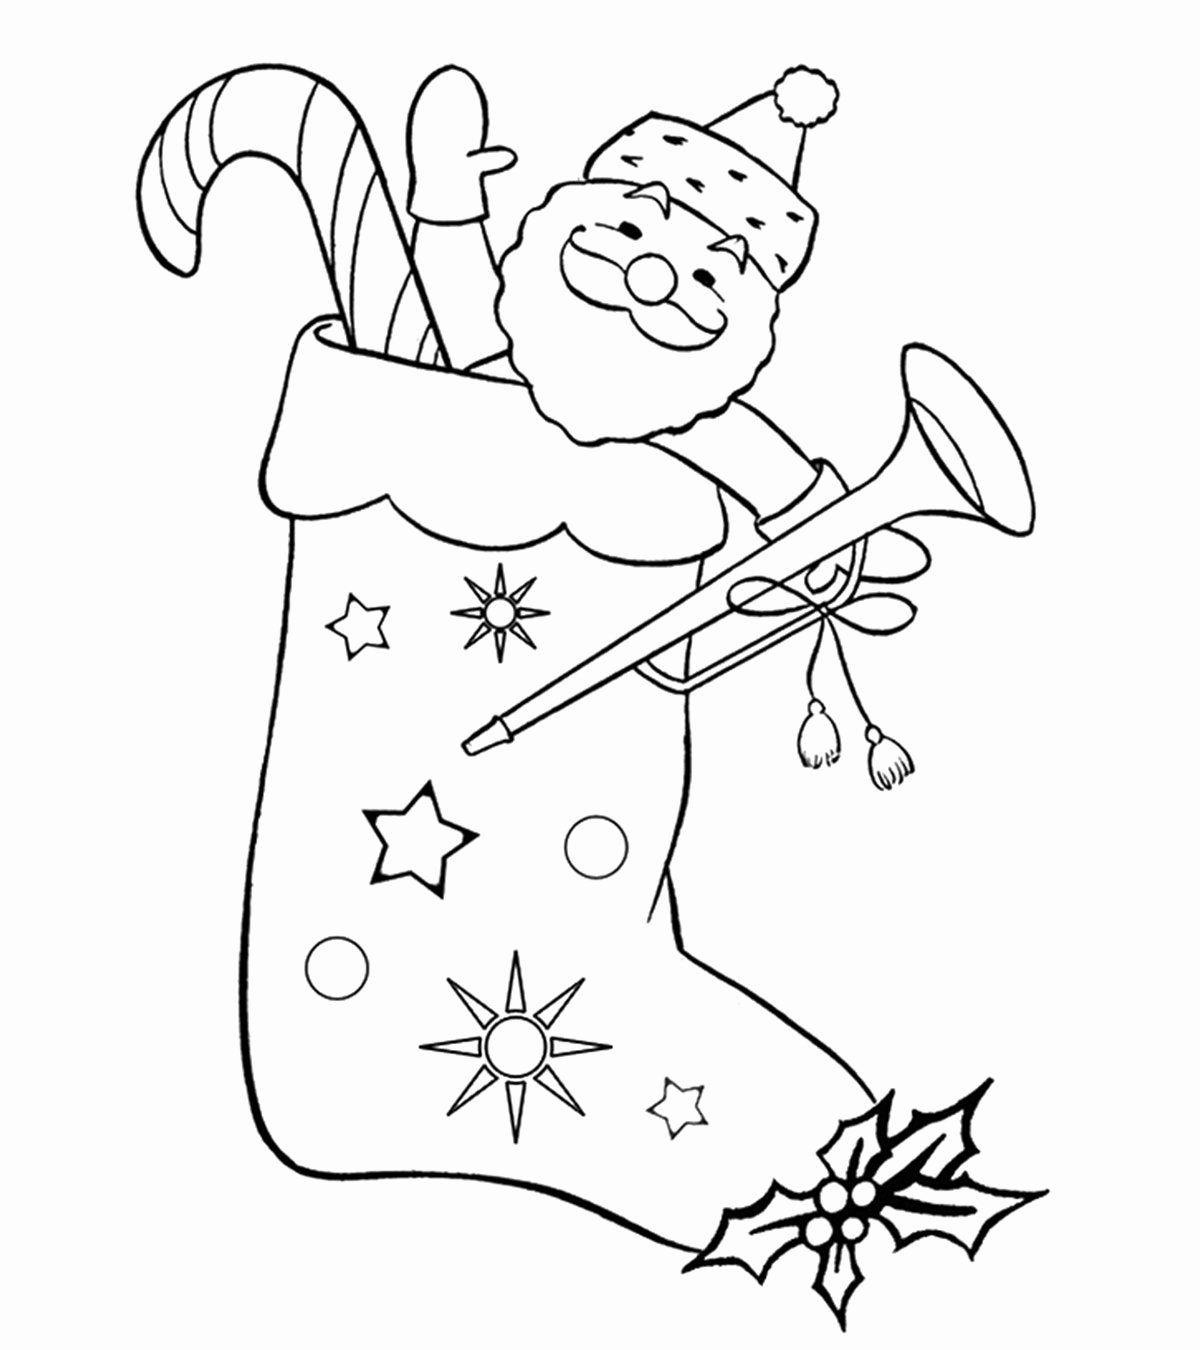 Print Coloring Image Momjunction Christmas Coloring Books Mickey Mouse Coloring Pages Christmas Coloring Sheets